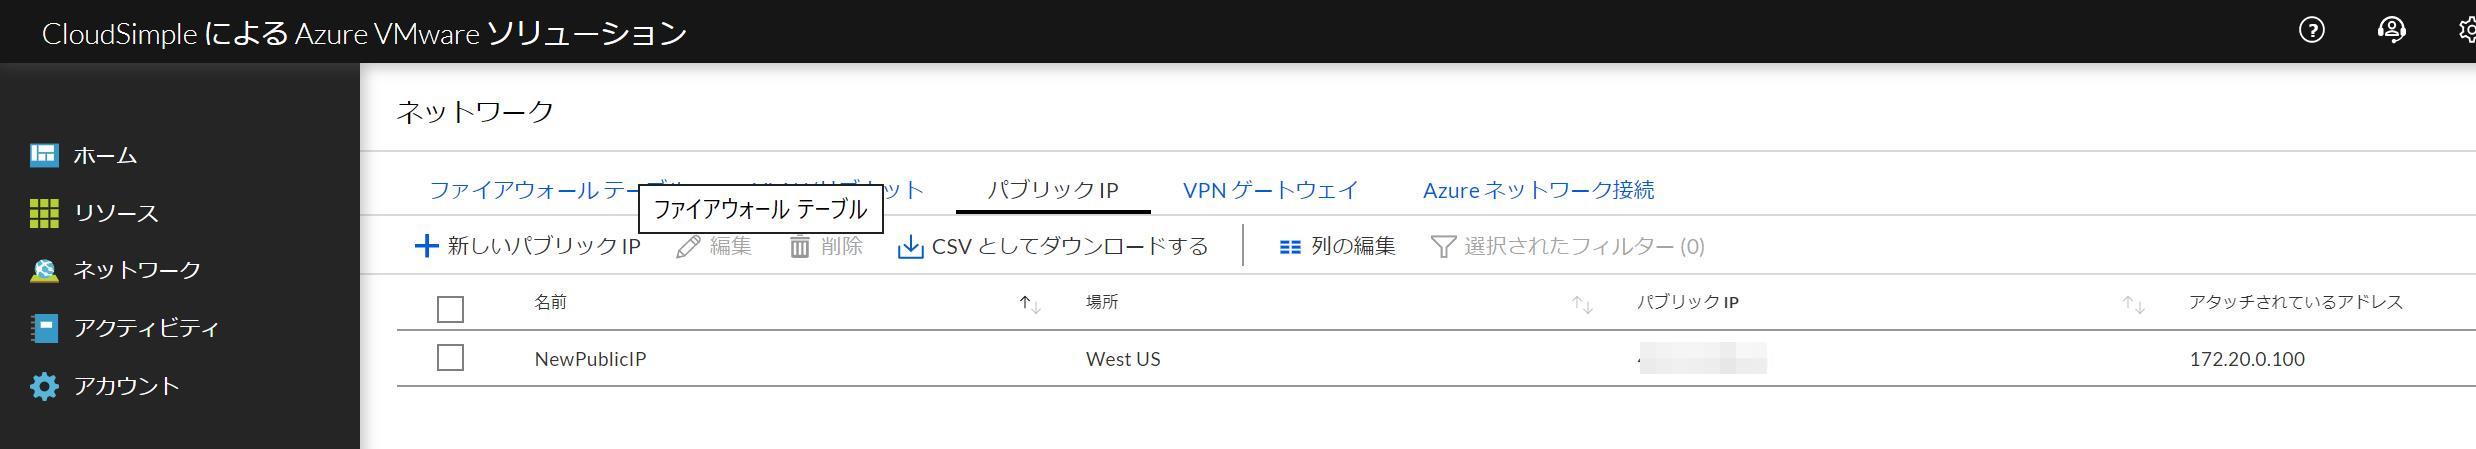 CloudSimpleポータルのパブリックIPアドレス管理画面